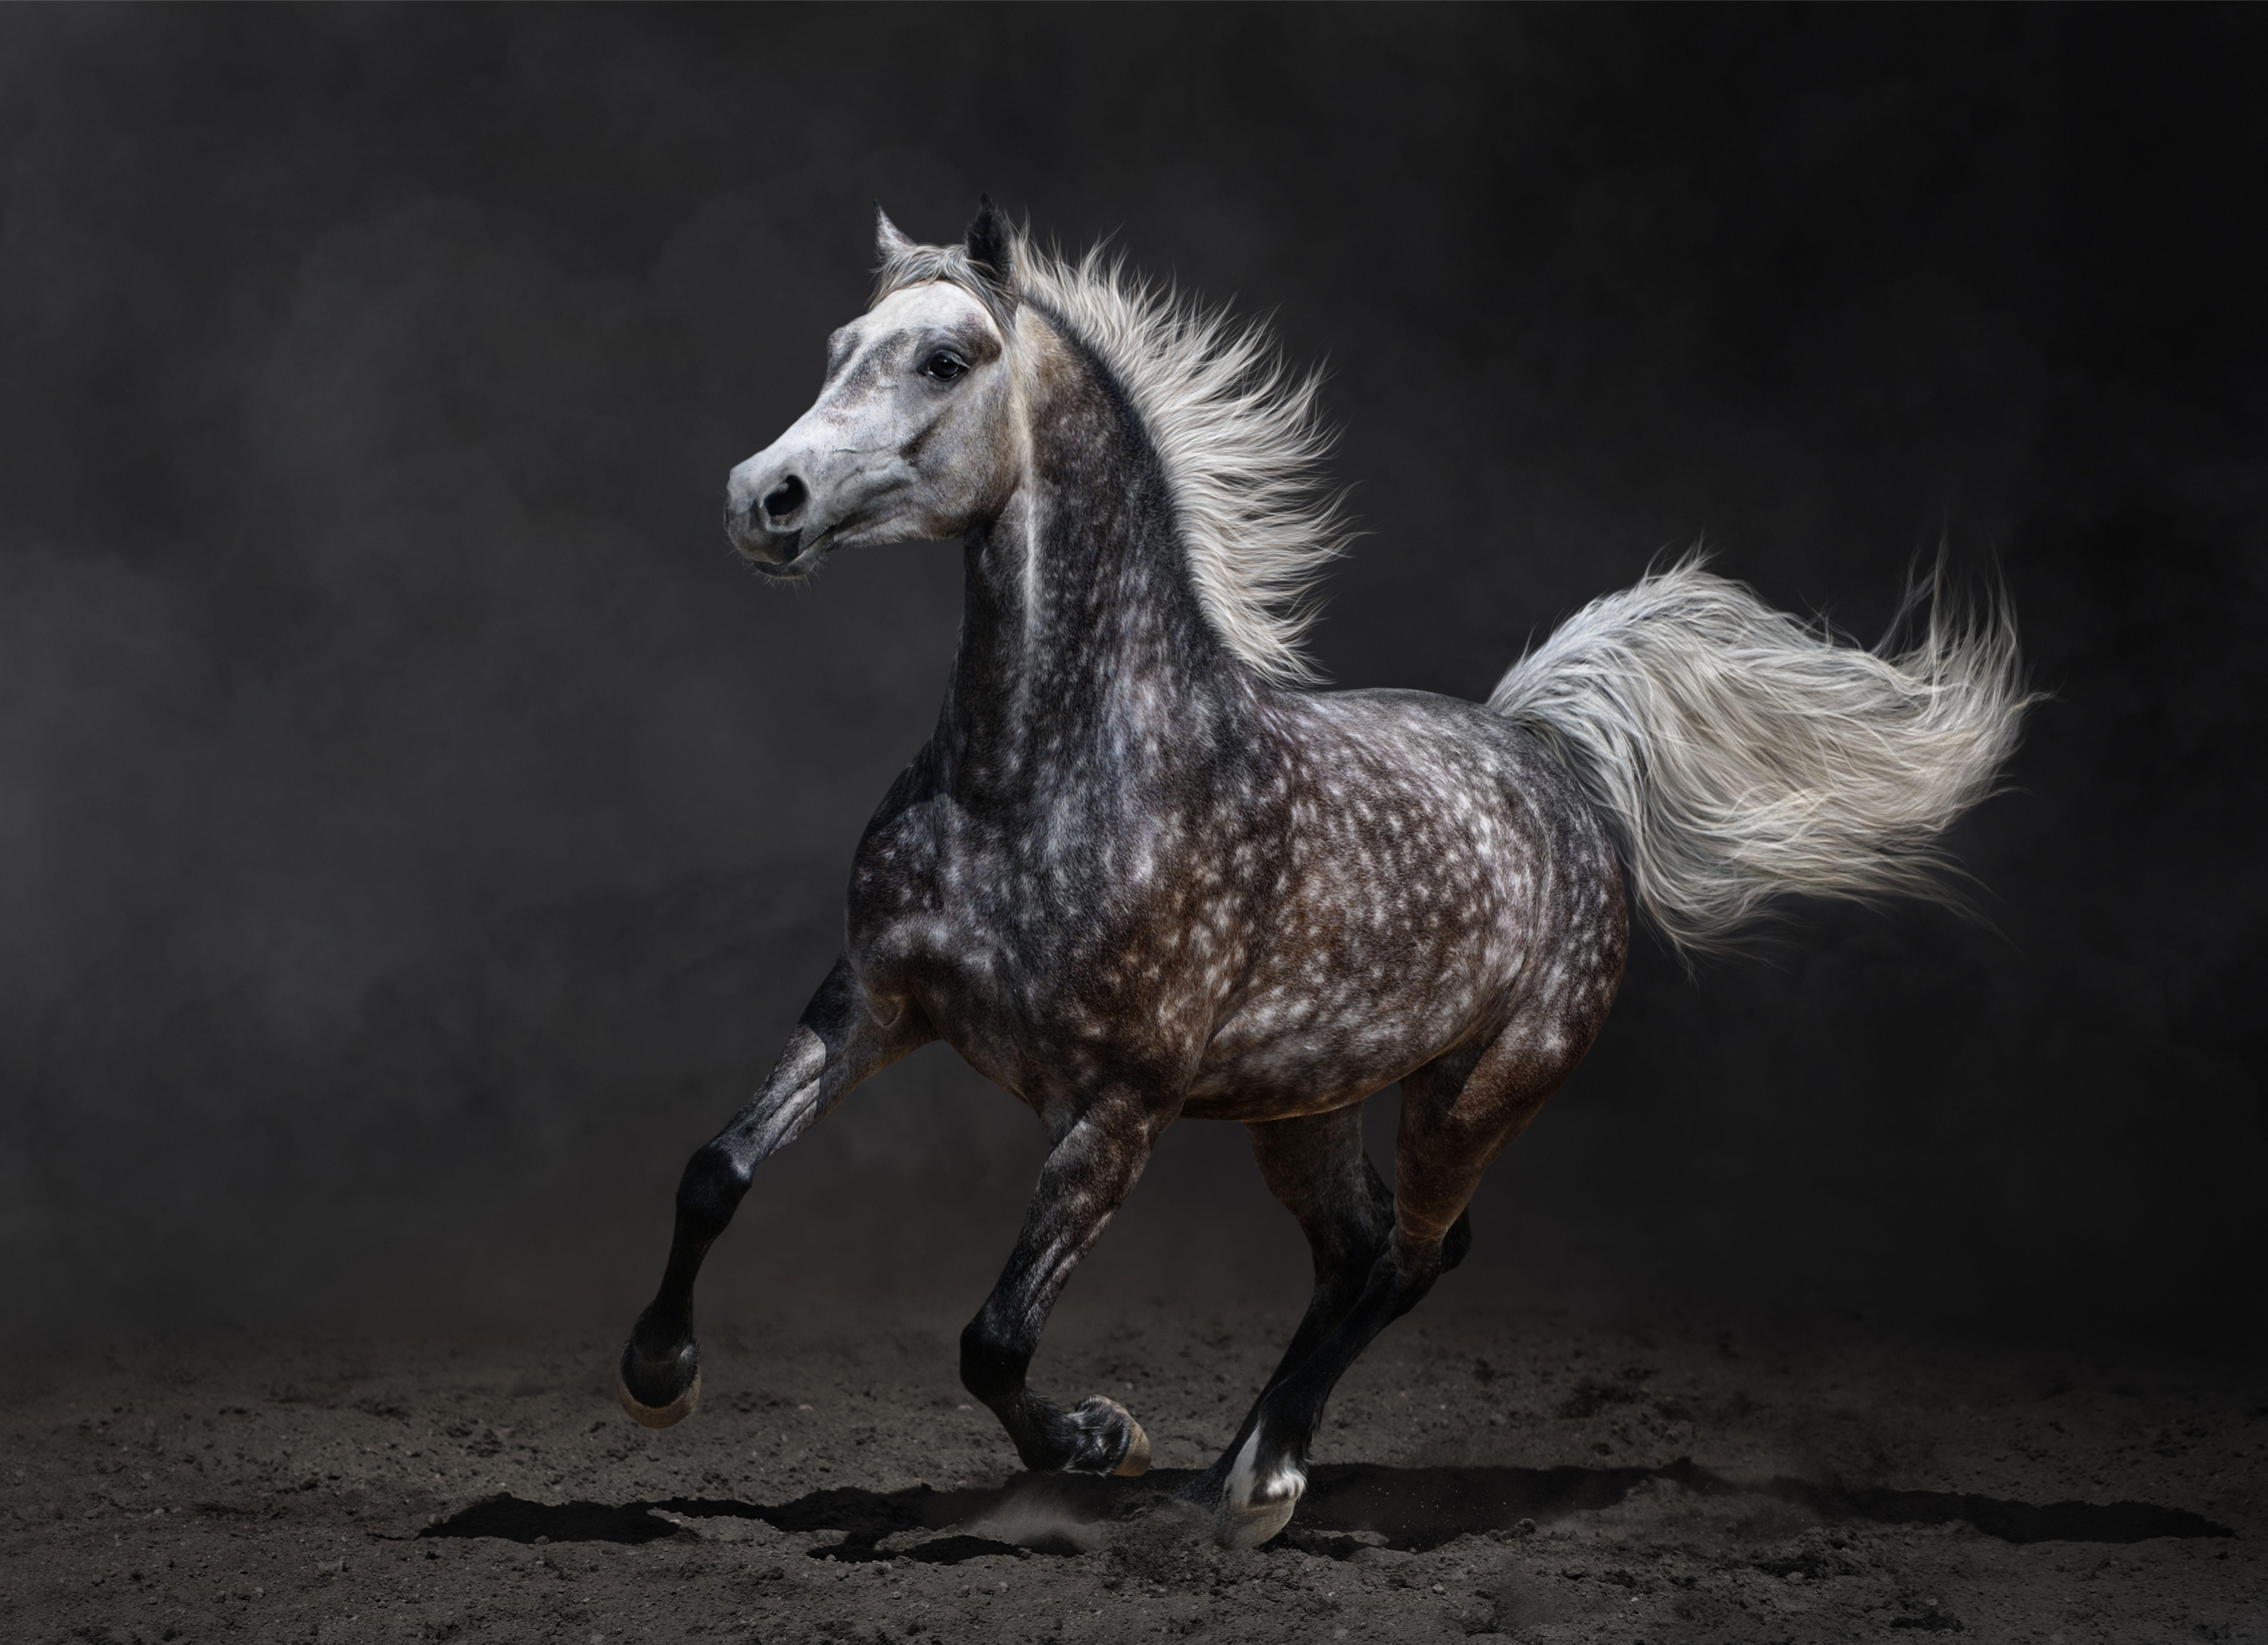 Beautiful Photography Arabian Horse Fonds D Ecran Cheval Courir Animaux Telecharger Photo Photographie Equestre Animaux Fond Ecran Cheval